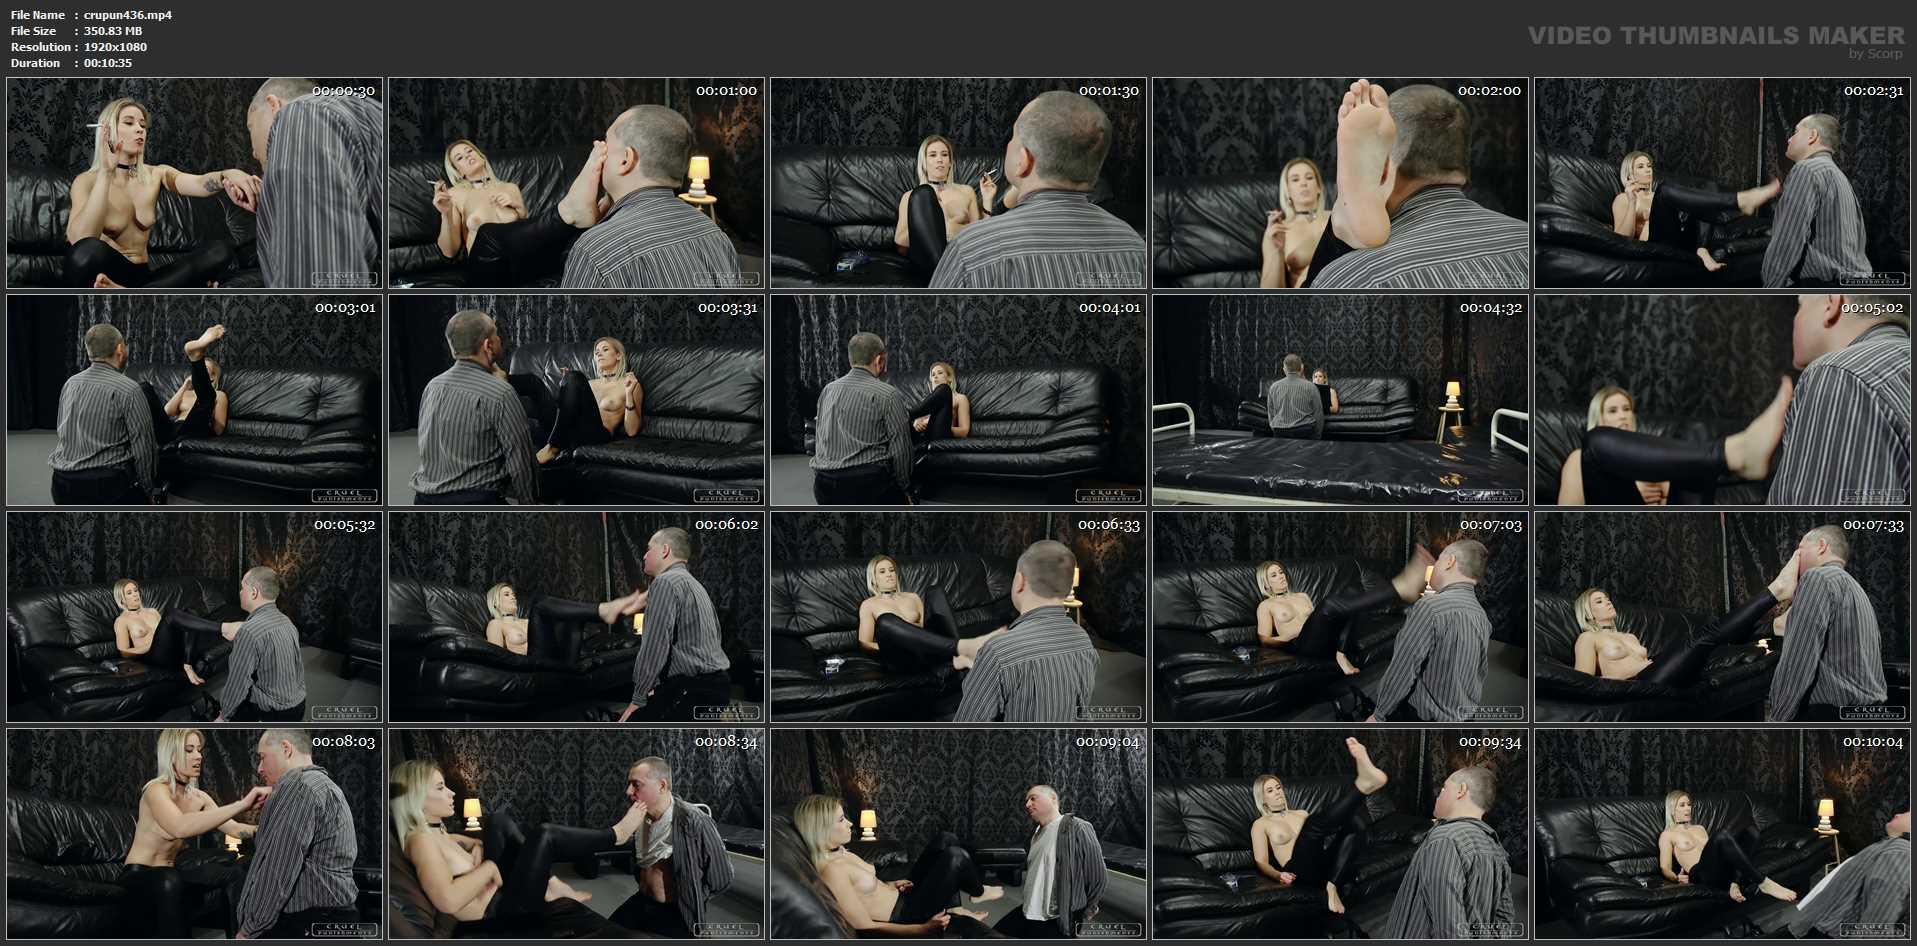 Mistress Anette In Scene: Slapped all over - CRUEL PUNISHMENTS - SEVERE FEMDOM - FULL HD/1080p/MP4